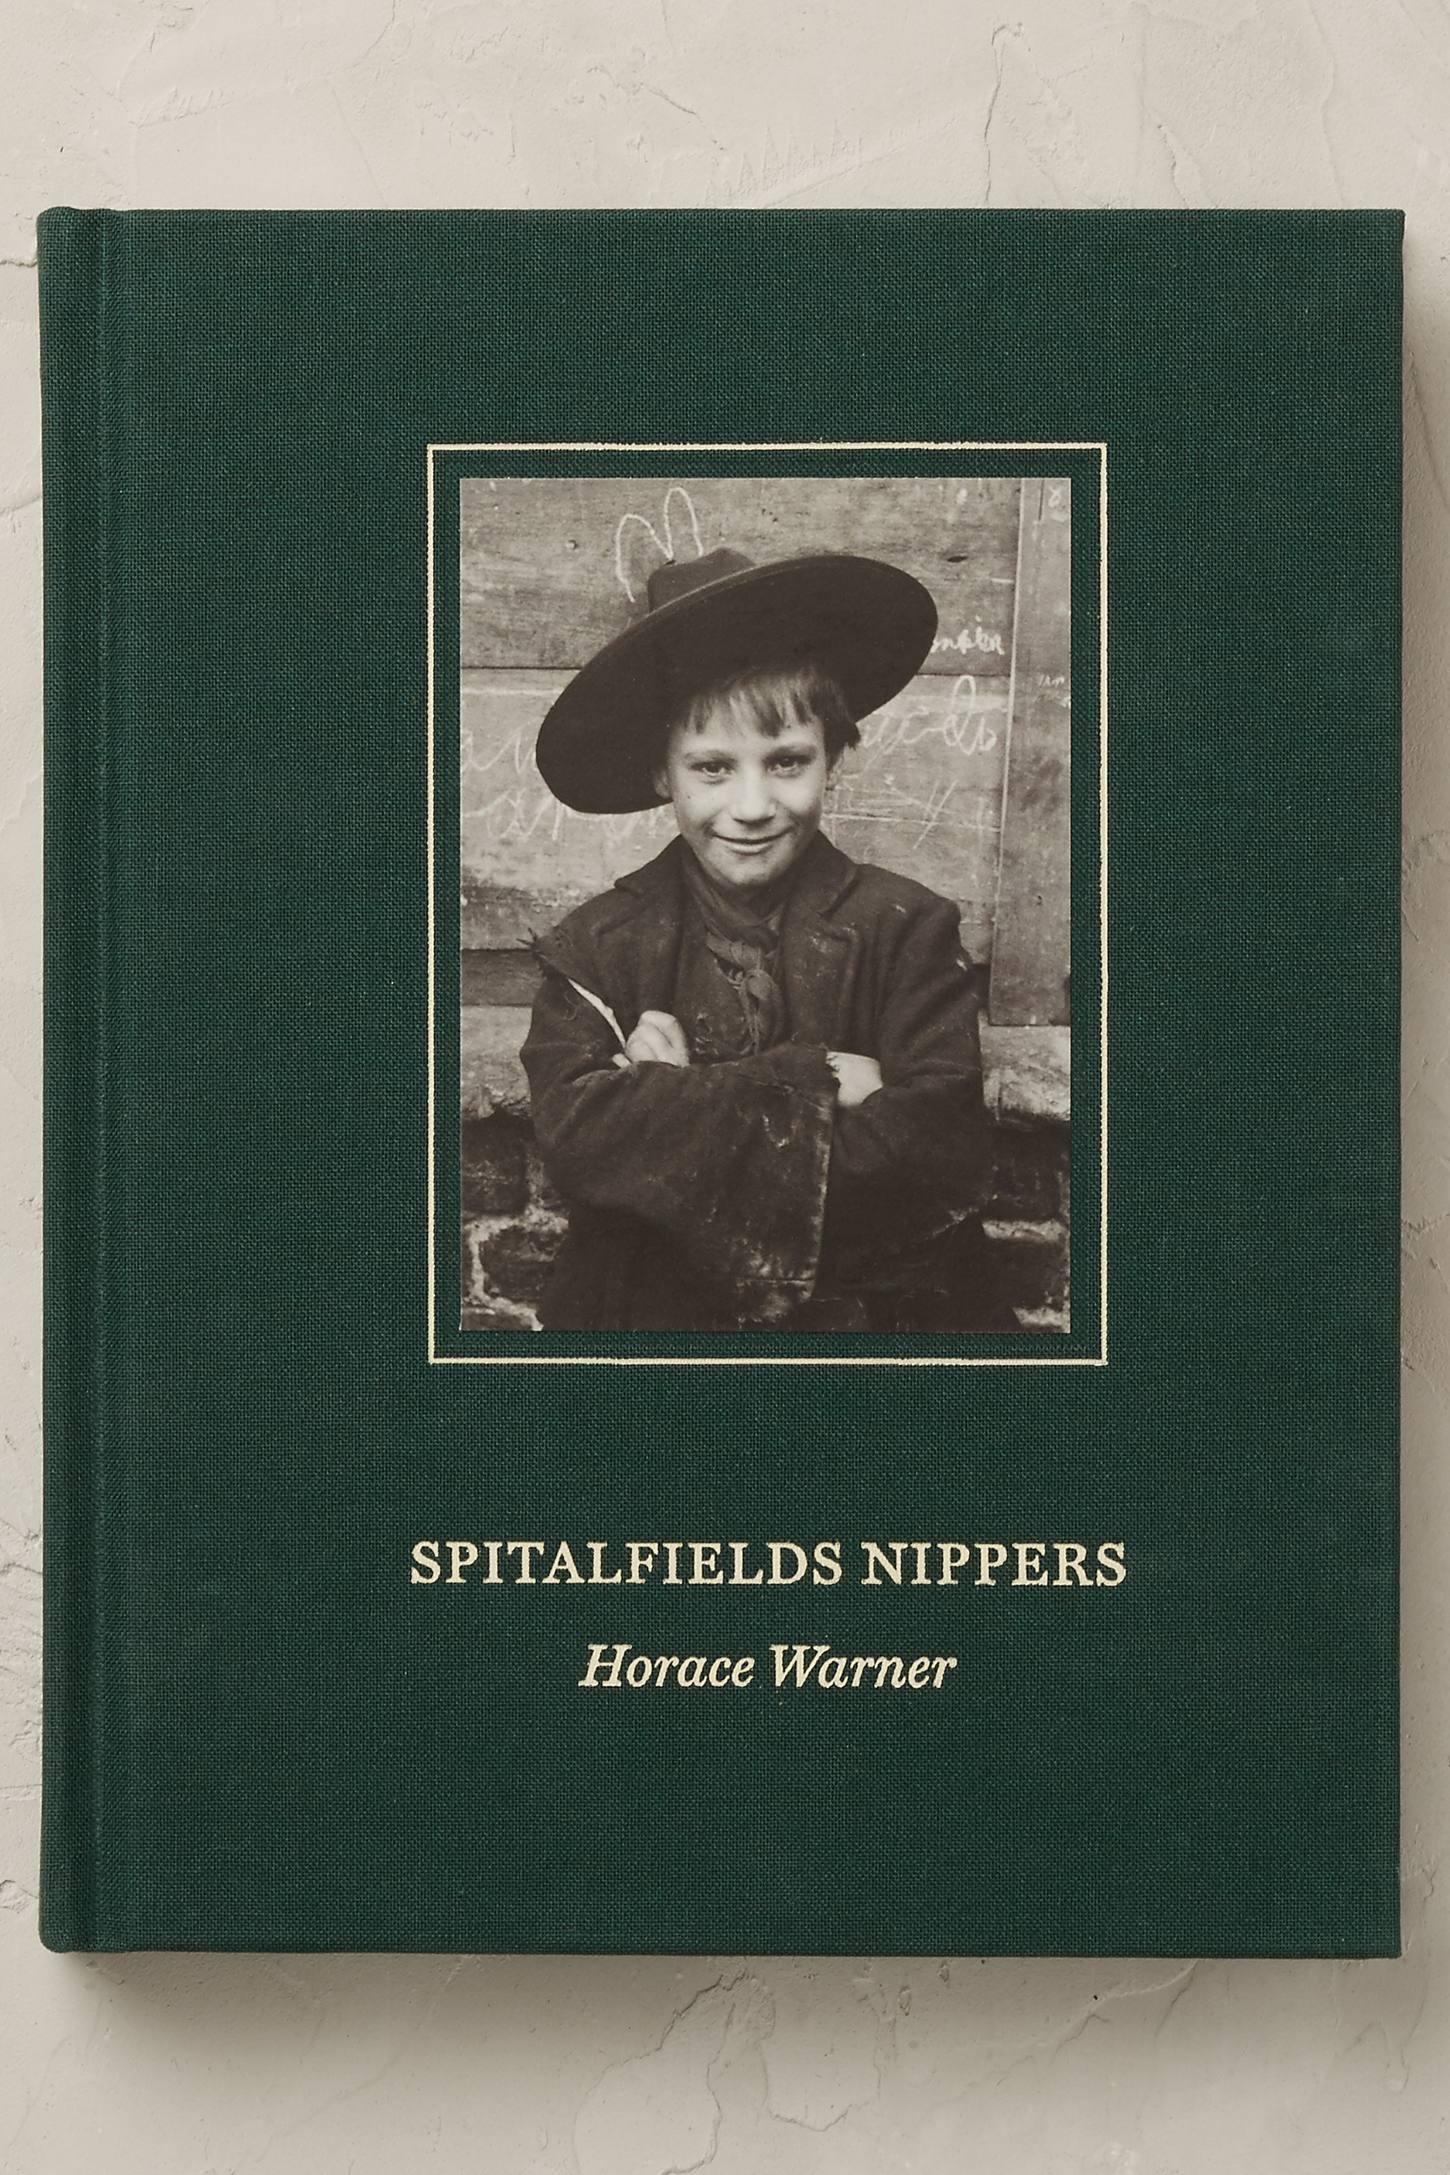 Spitalfields Nippers